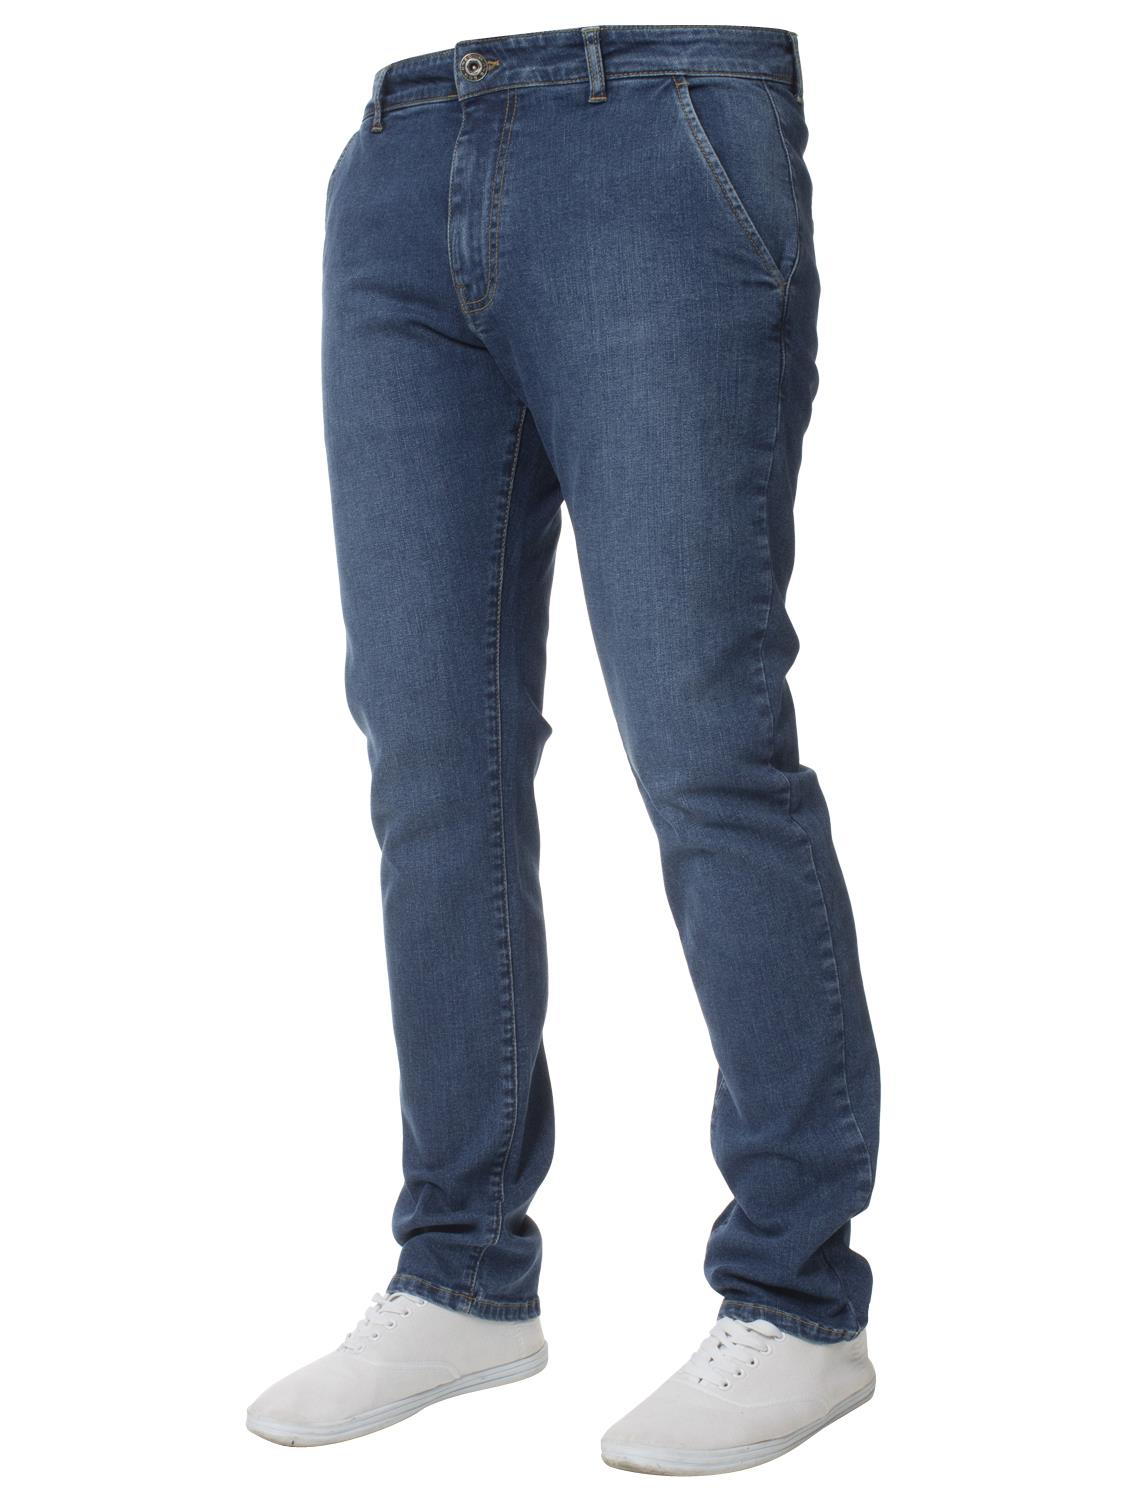 Enzo-Mens-Big-Tall-Jeans-Leg-King-Size-Denim-Pants-Chino-Trousers-Pants-44-034-60-034 thumbnail 34